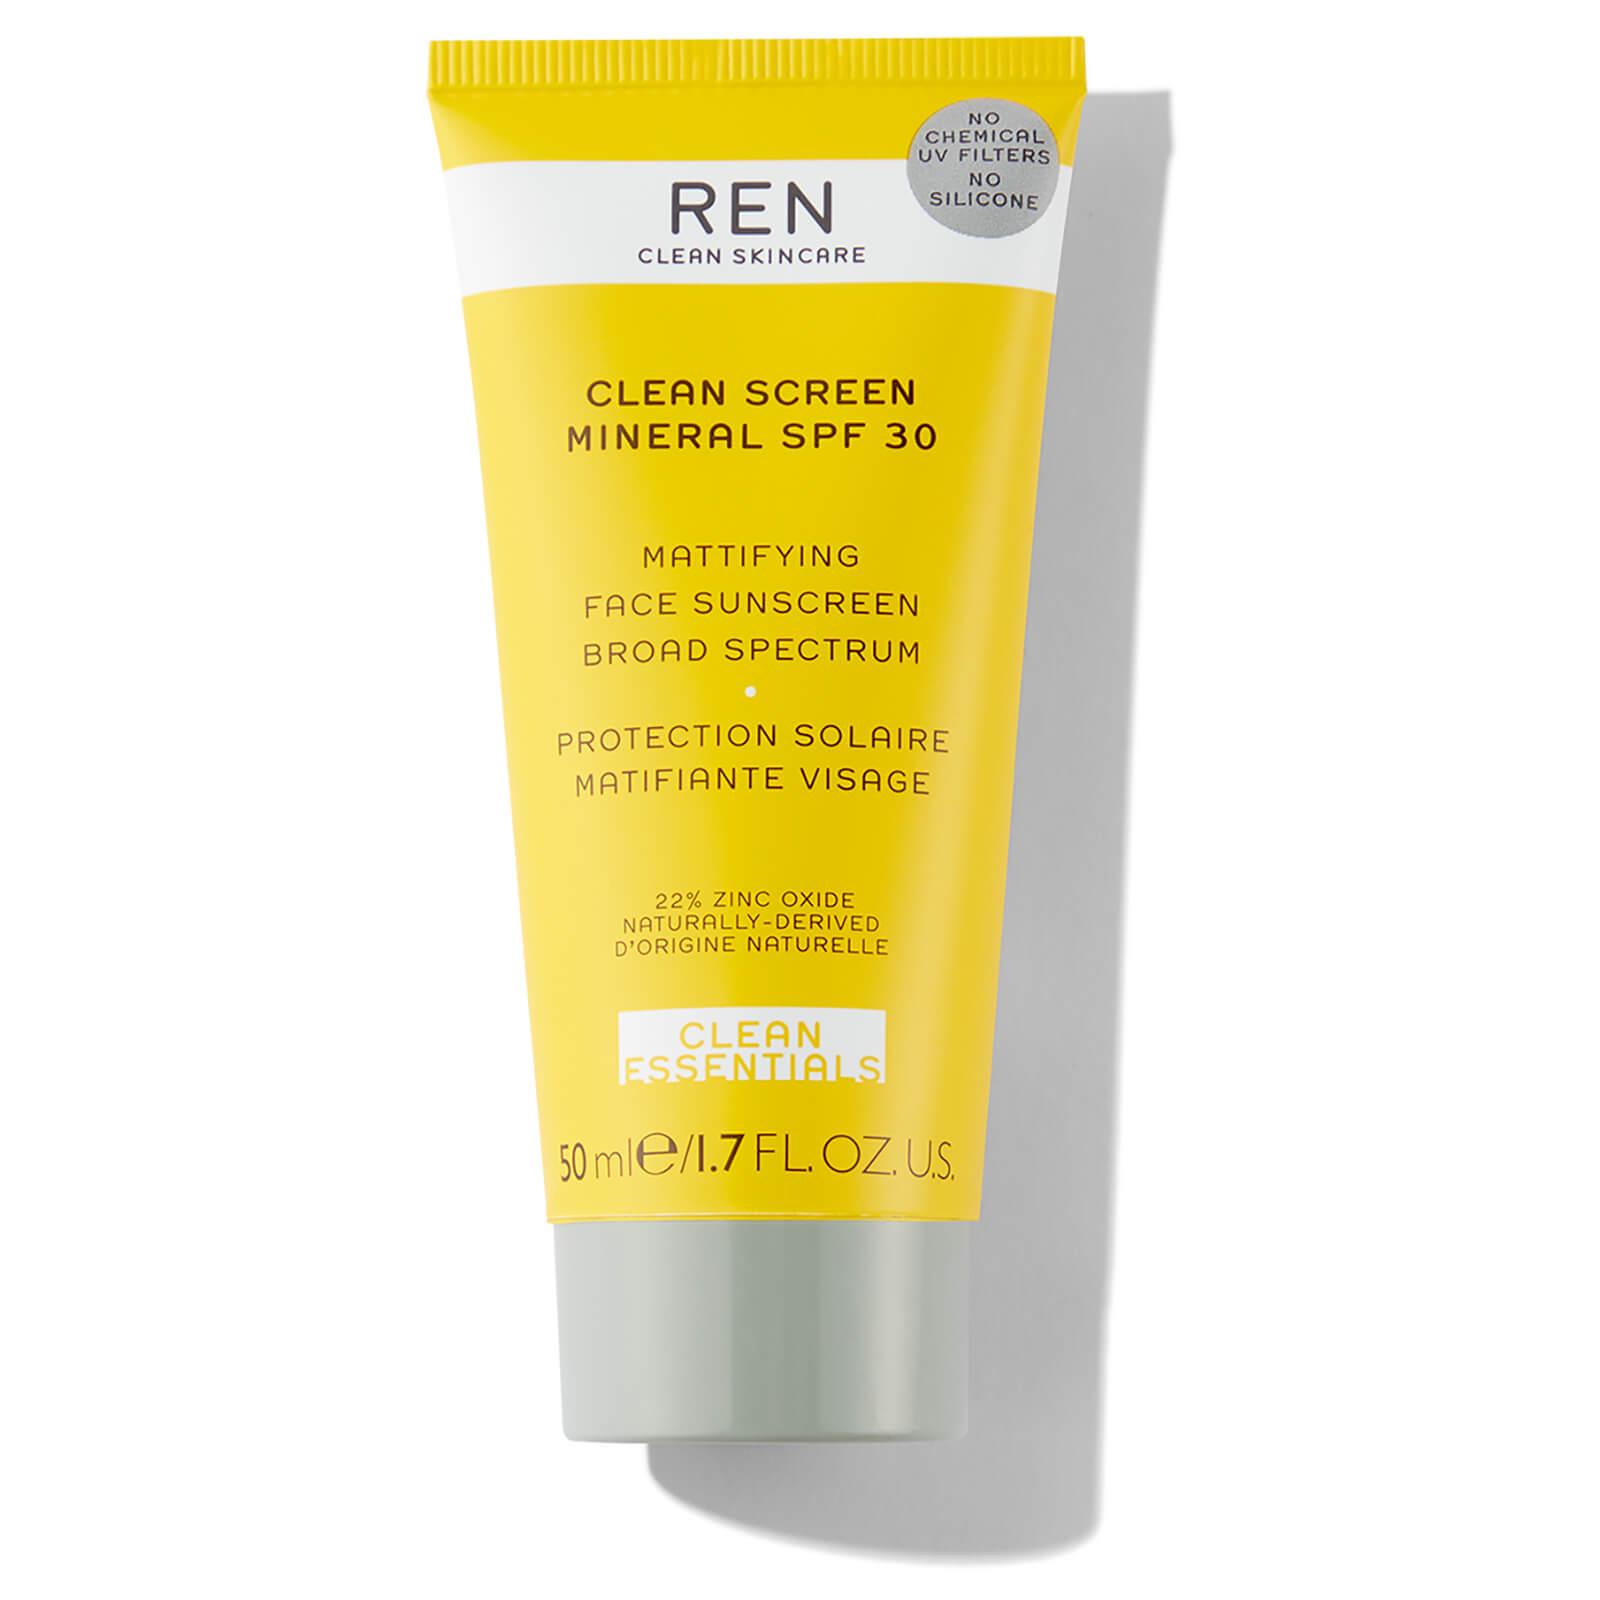 REN Clean Skincare - Clean Screen Mineral SPF30